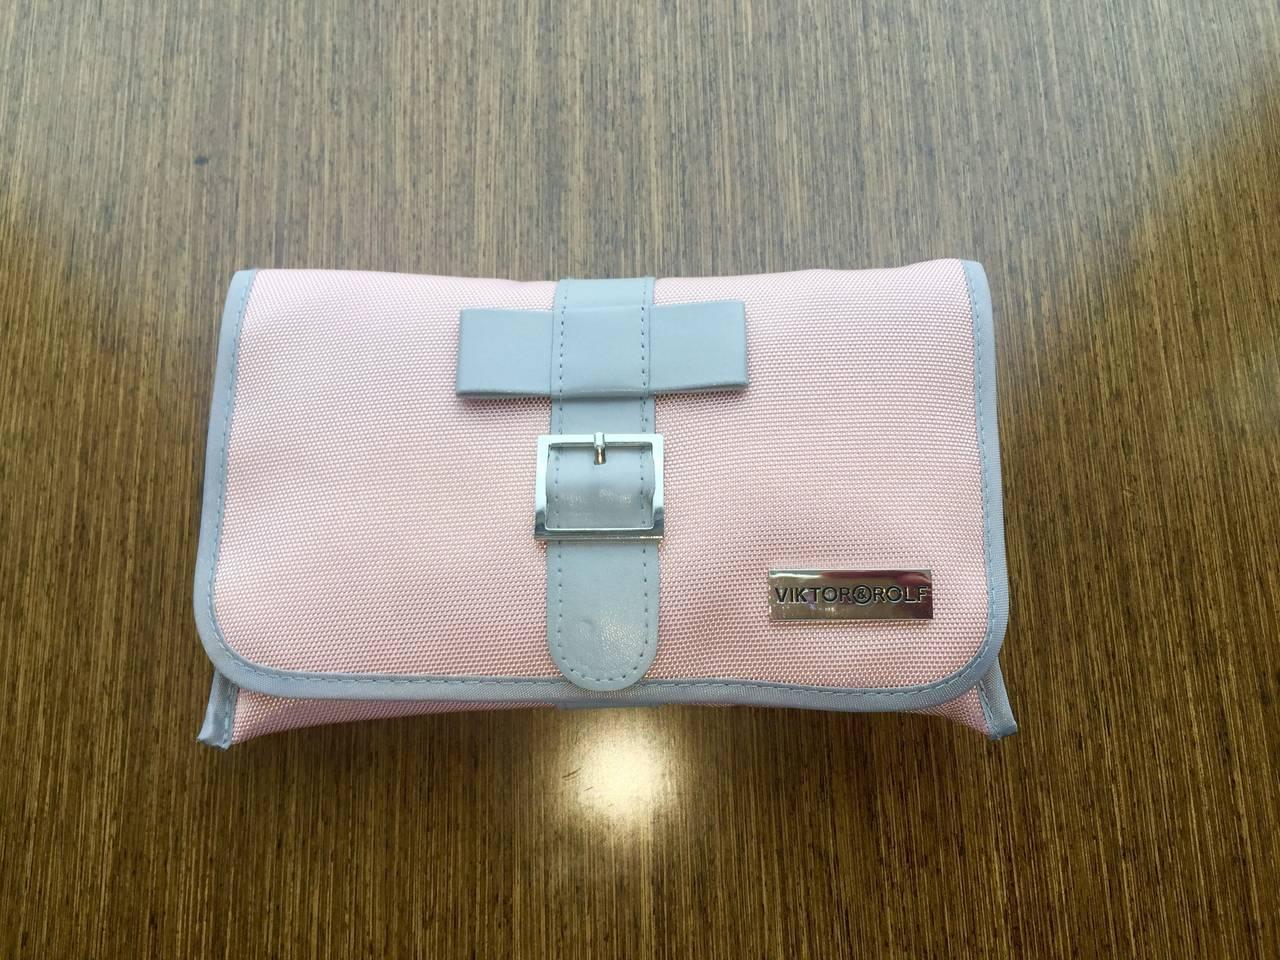 viktor and rolf limited edition klm pink bow wristlet clutch purse for sale at 1stdibs. Black Bedroom Furniture Sets. Home Design Ideas